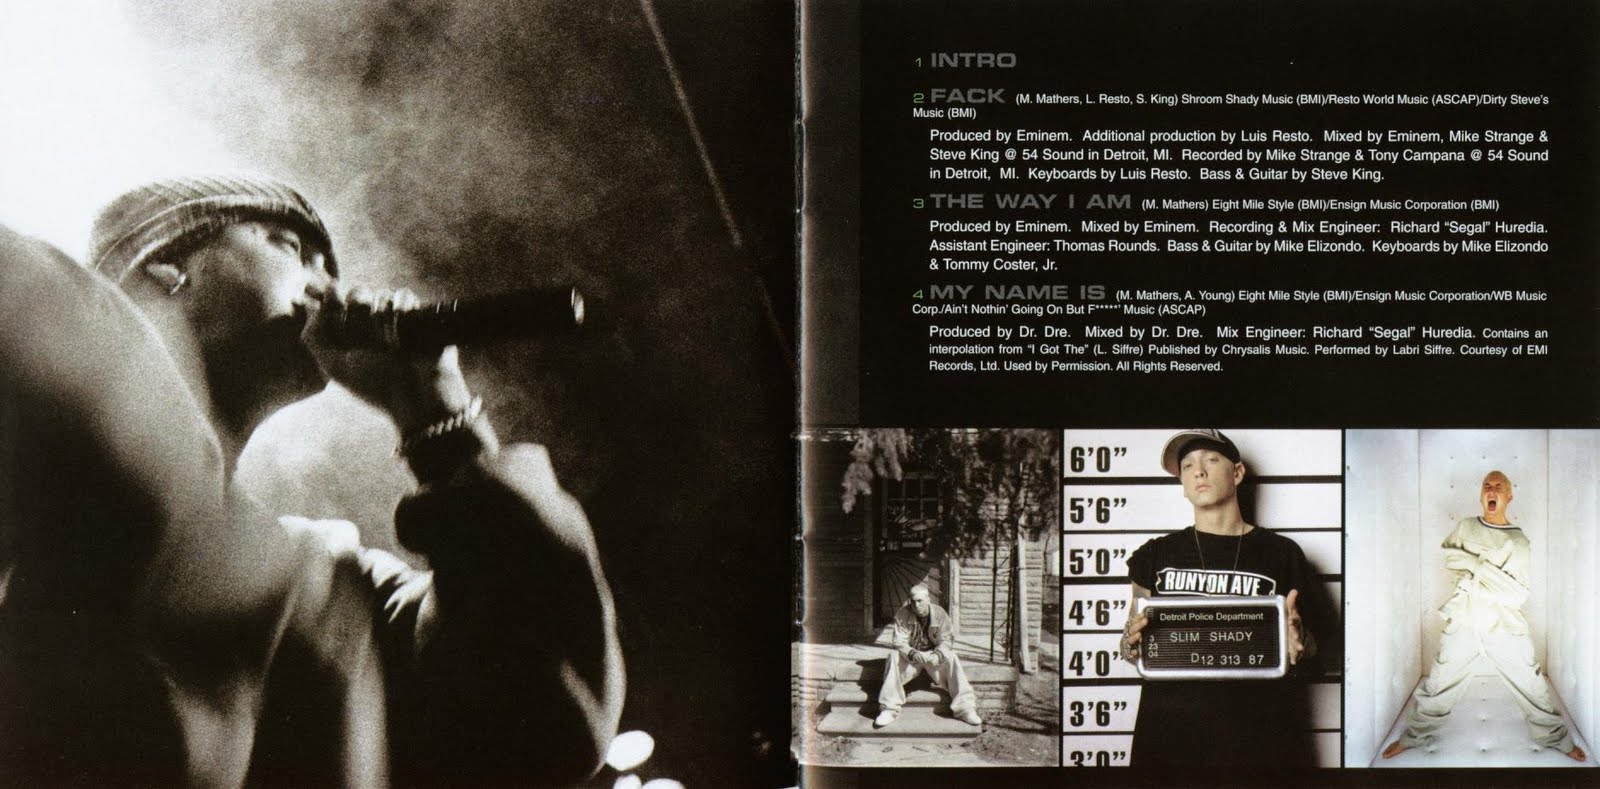 Curtain call eminem - Tags Booklet Eminem